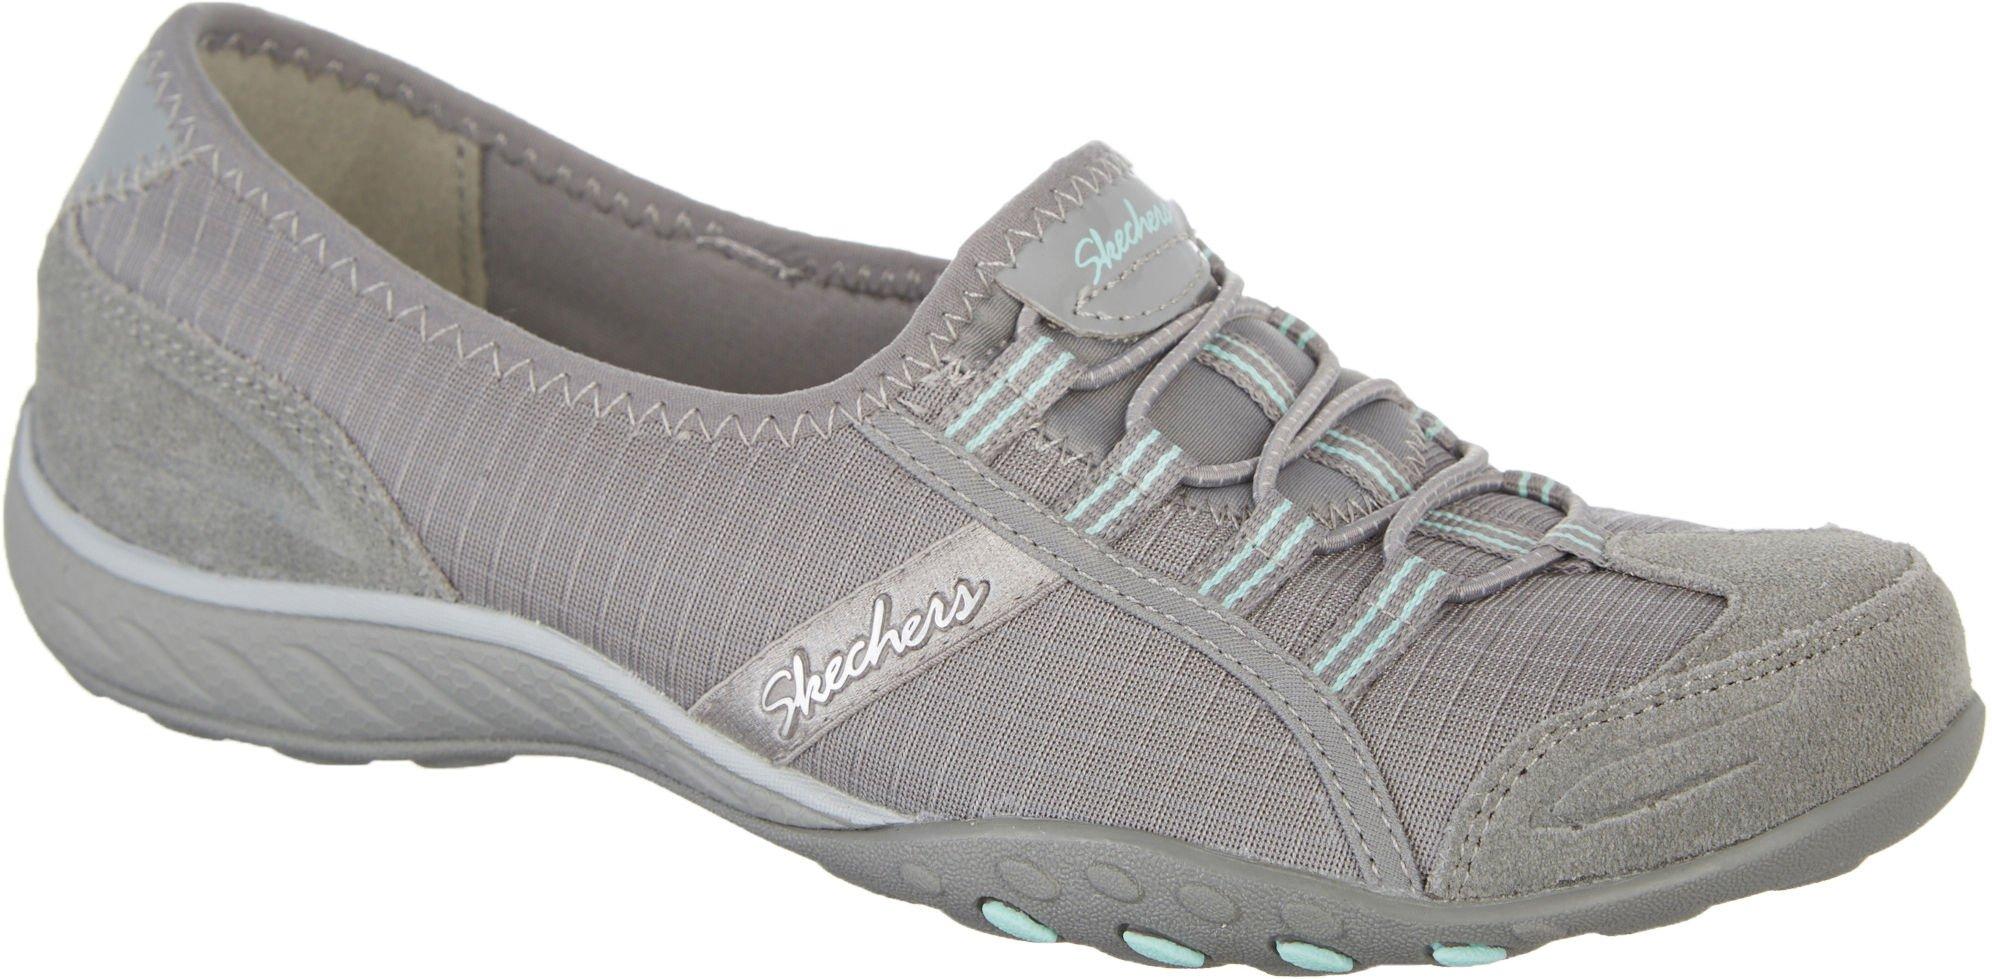 Skechers Relaxed Fit Breathe Easy Allure Womens Slip On Sneakers Gray 8